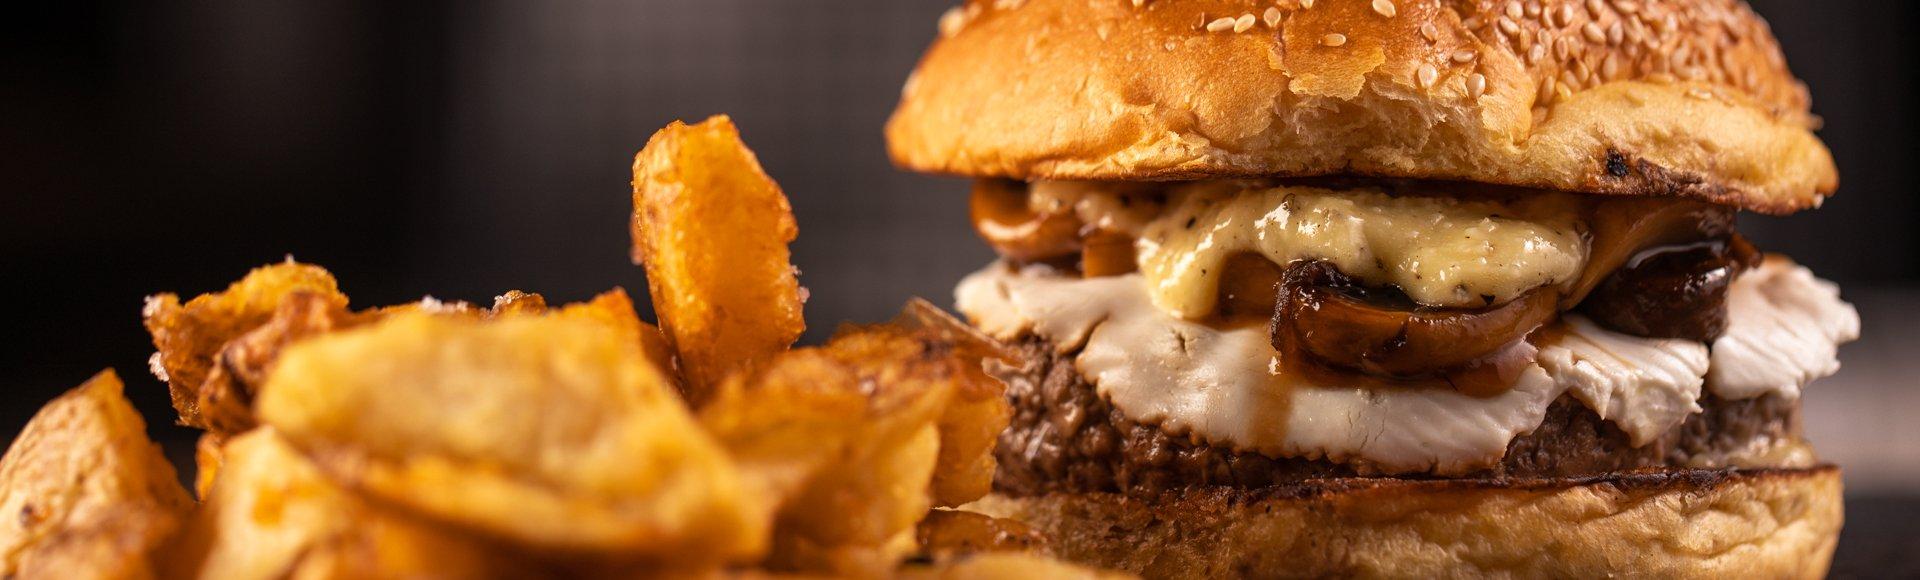 Burger με μανιτάρια και κατσικίσιο τυρί